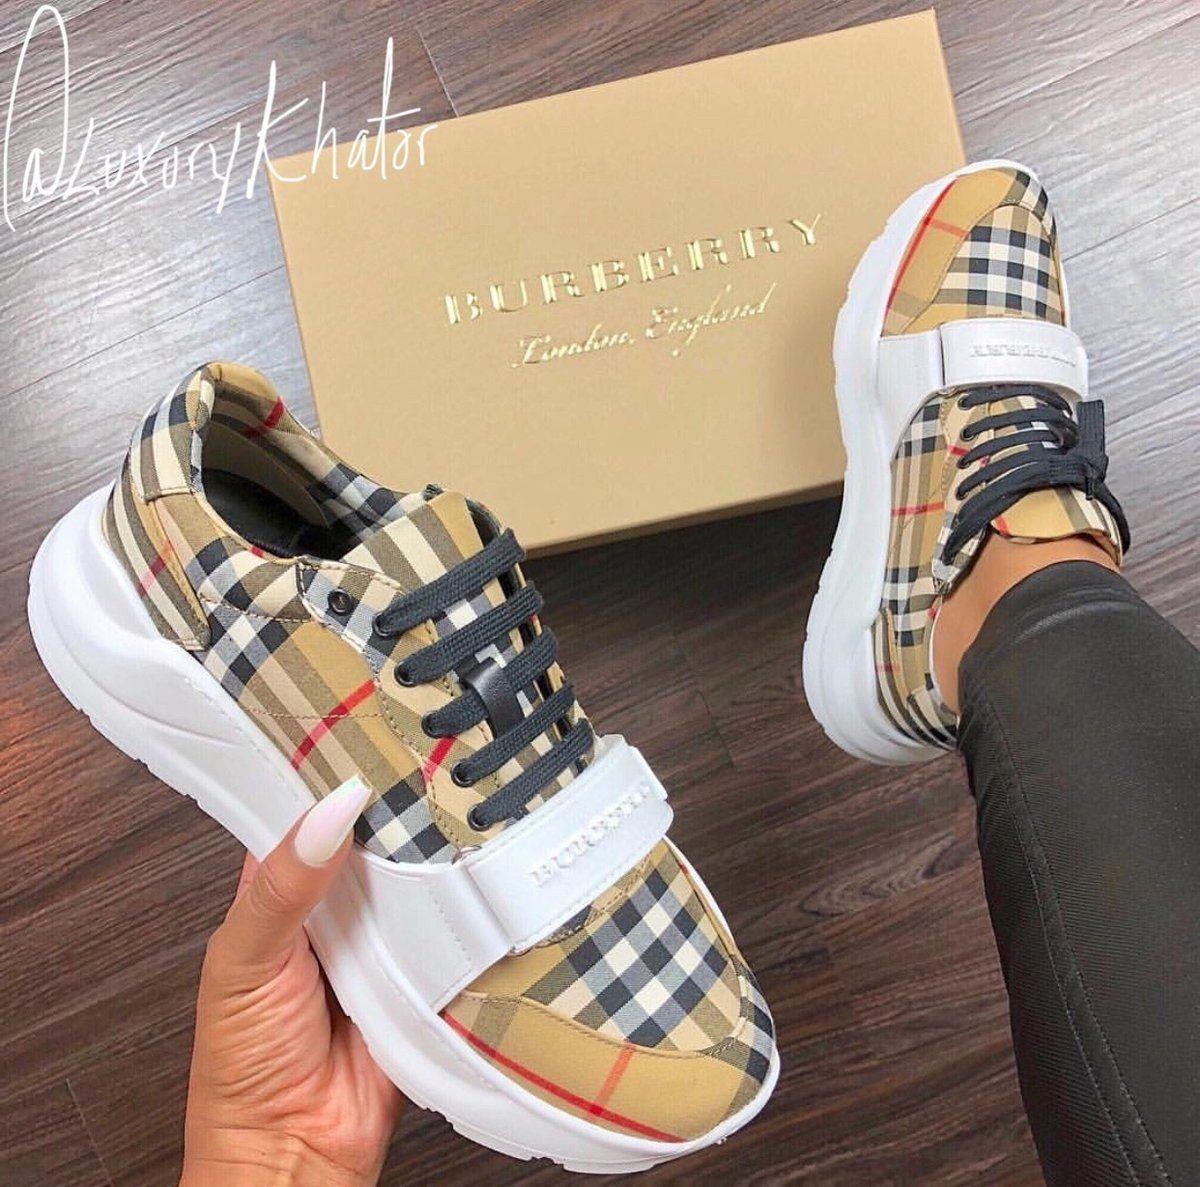 Berry Shoes – Luxury Kha'tor